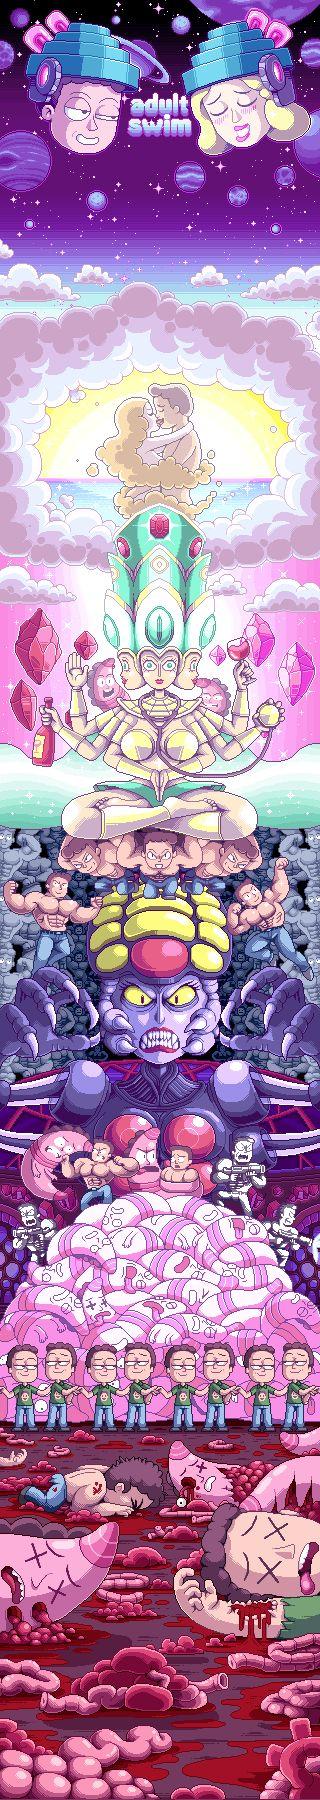 Rick and Morty animation for Adult Swim #pixelart #animation